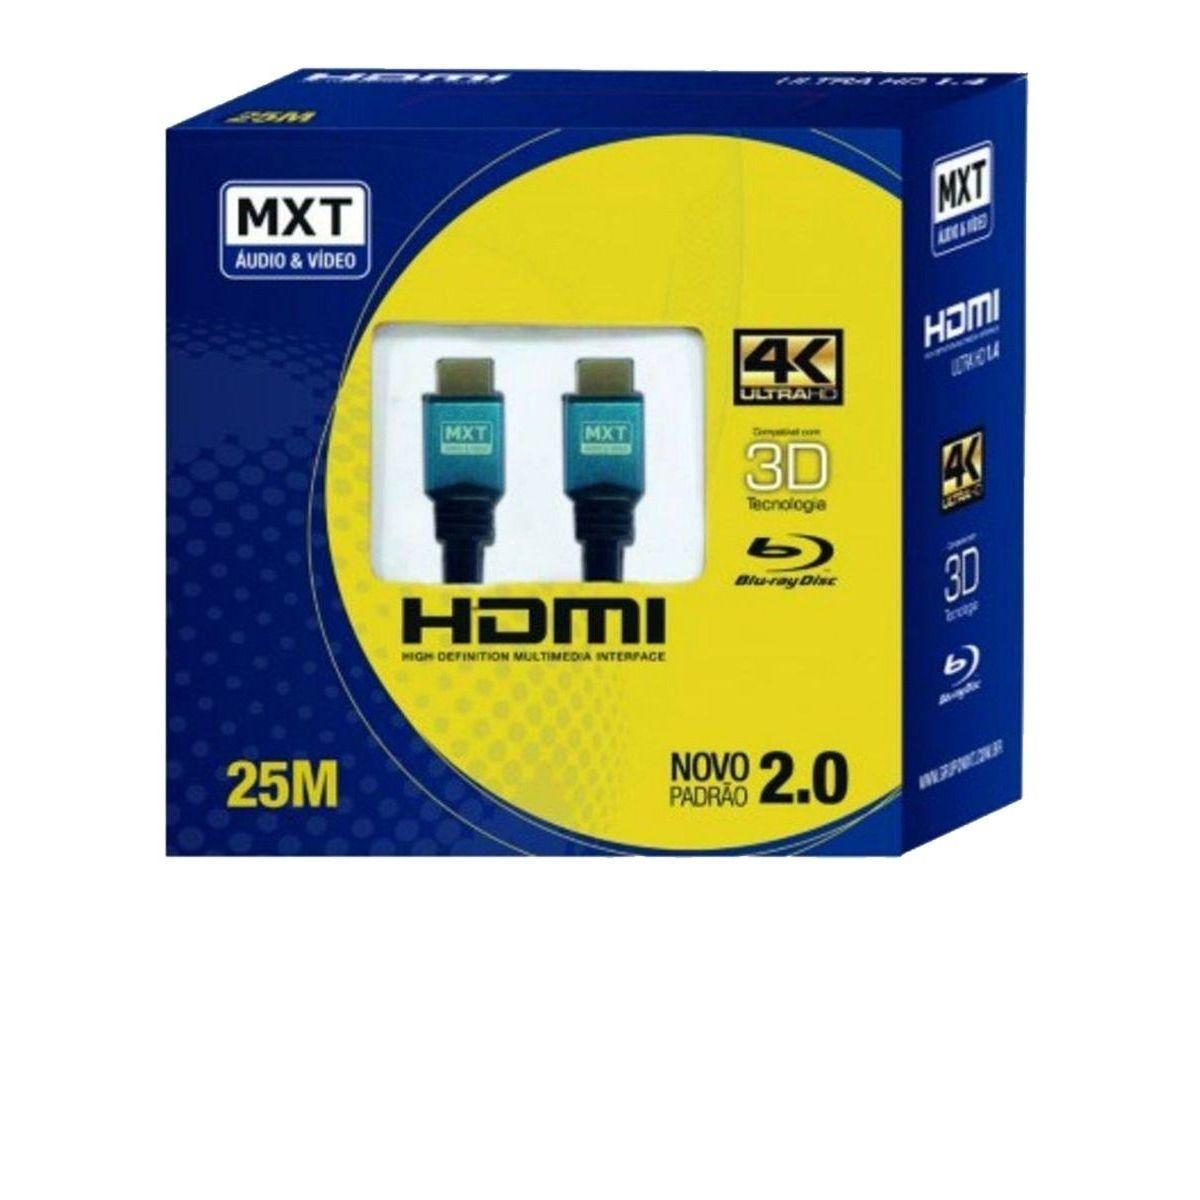 Cabo Hdmi MXT 4K 25 Metros